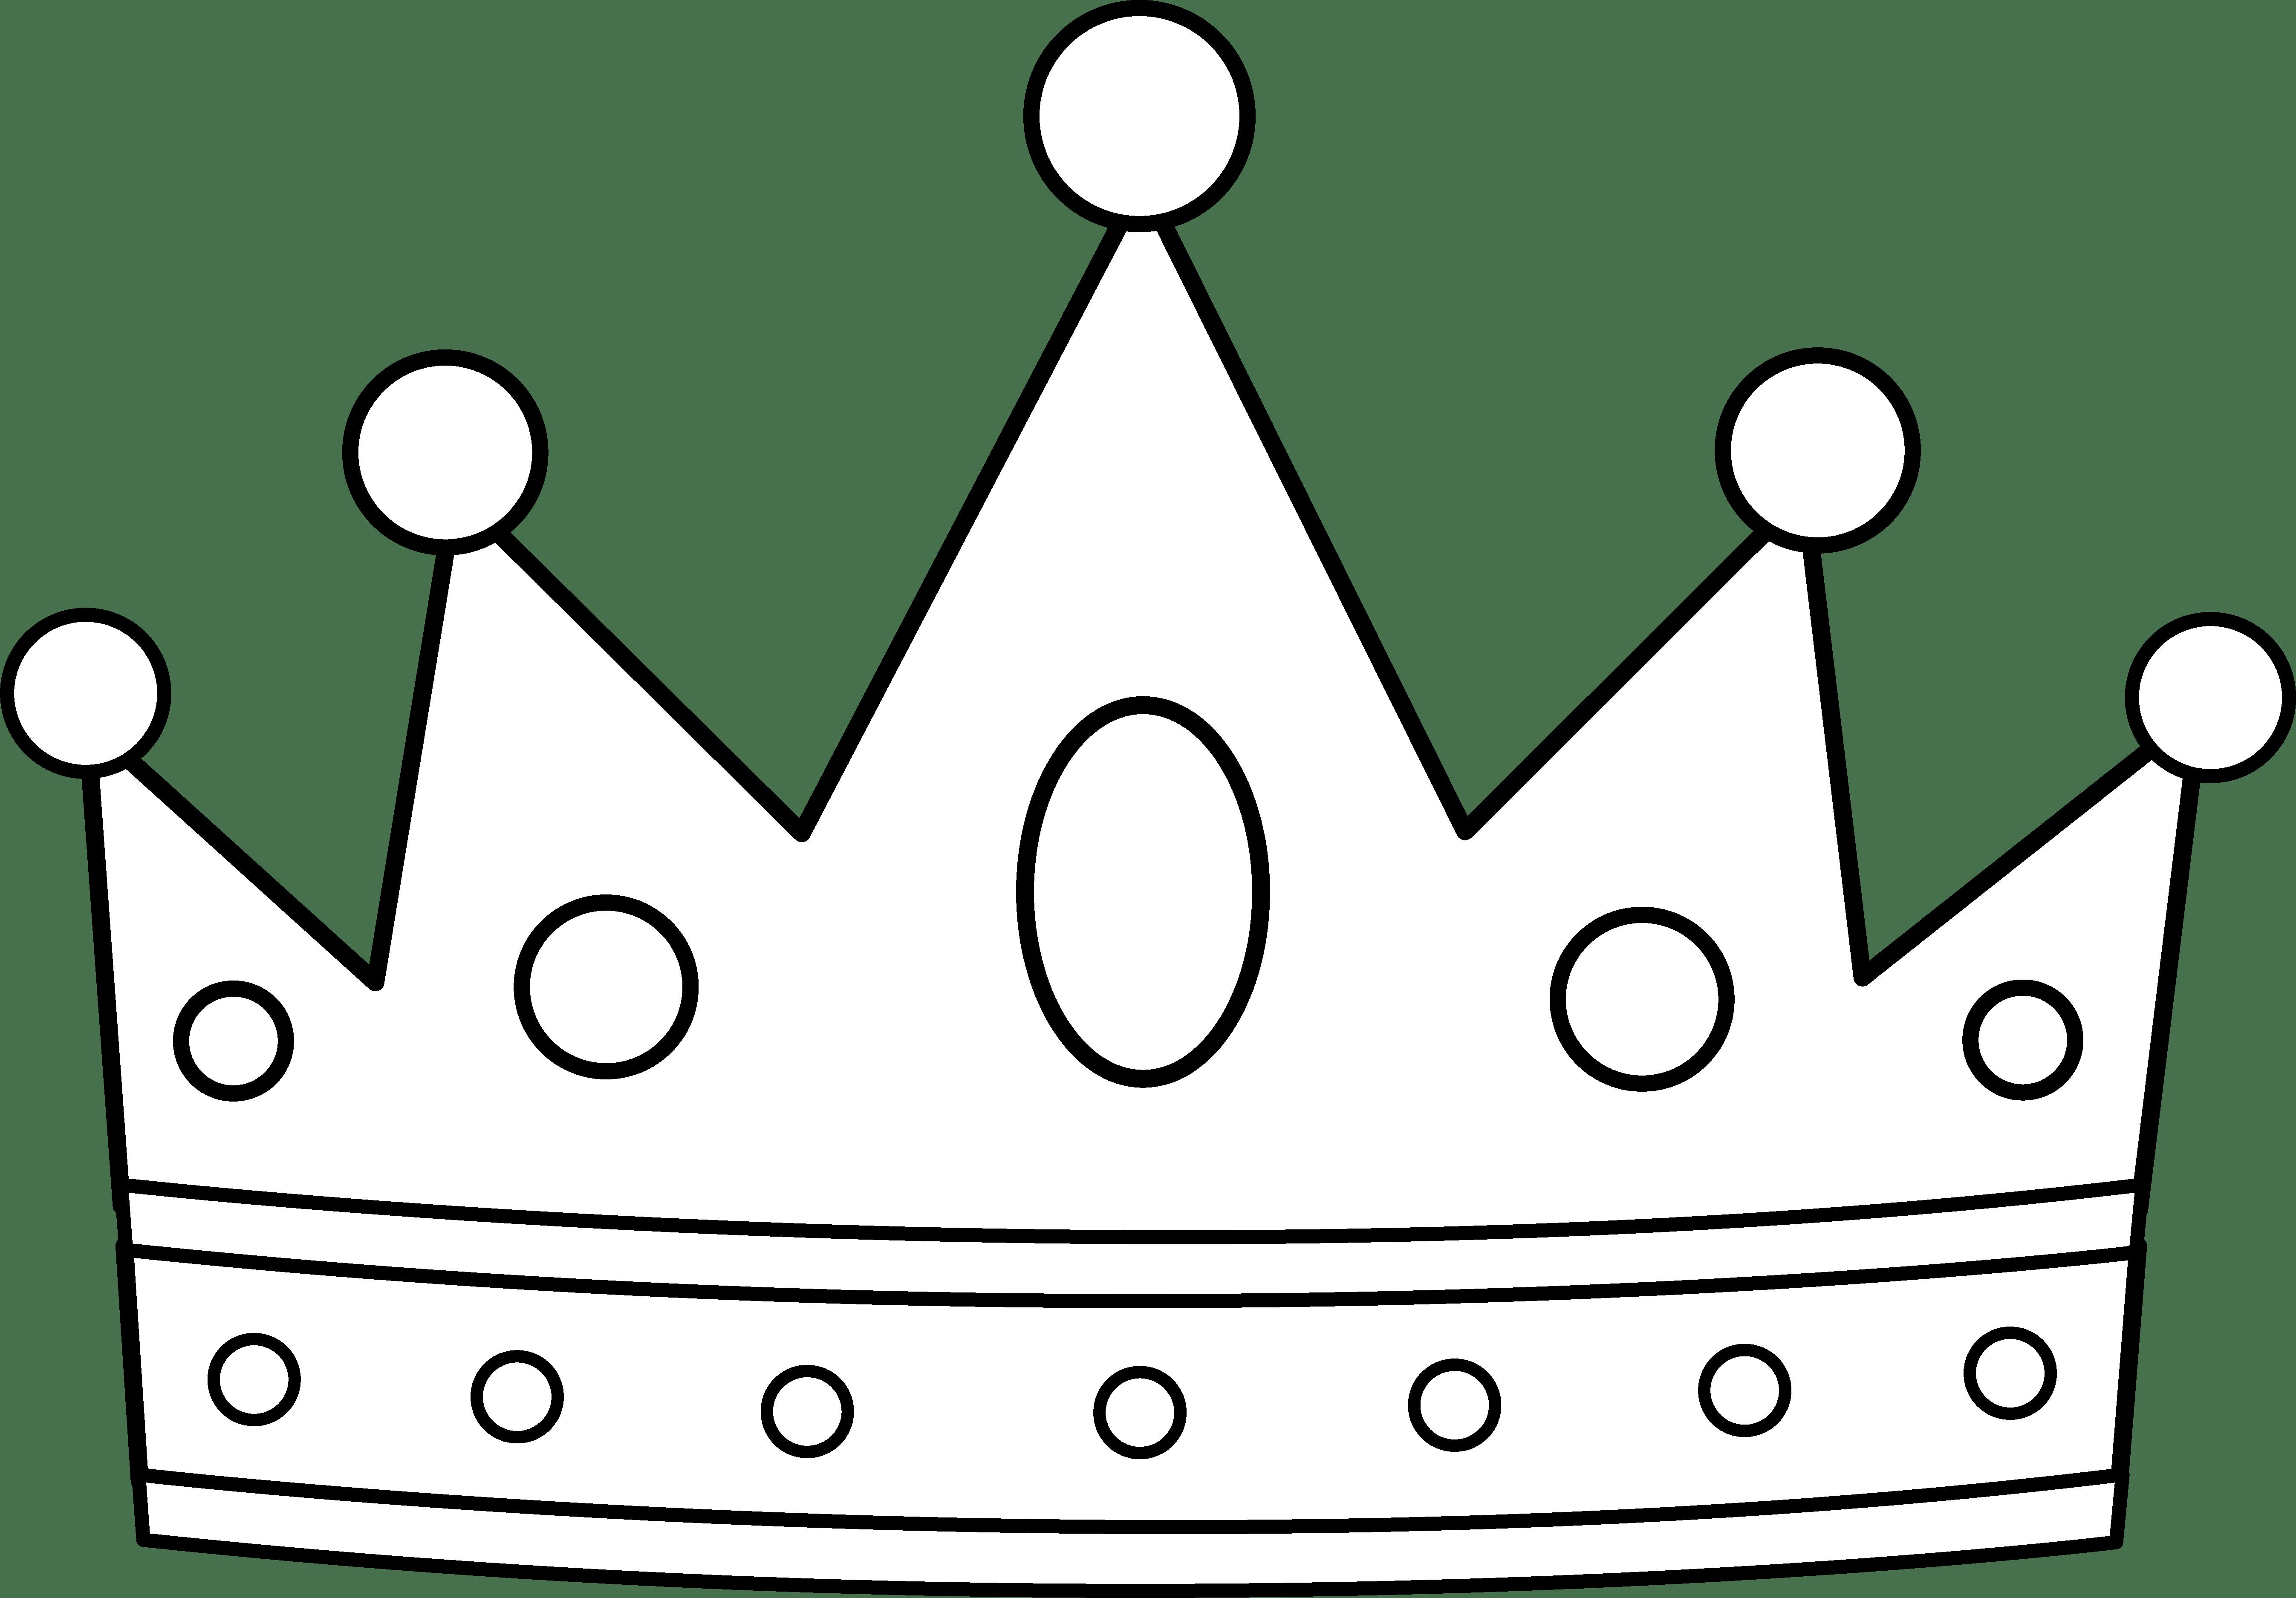 White crown clipart 4 » Clipart Portal.